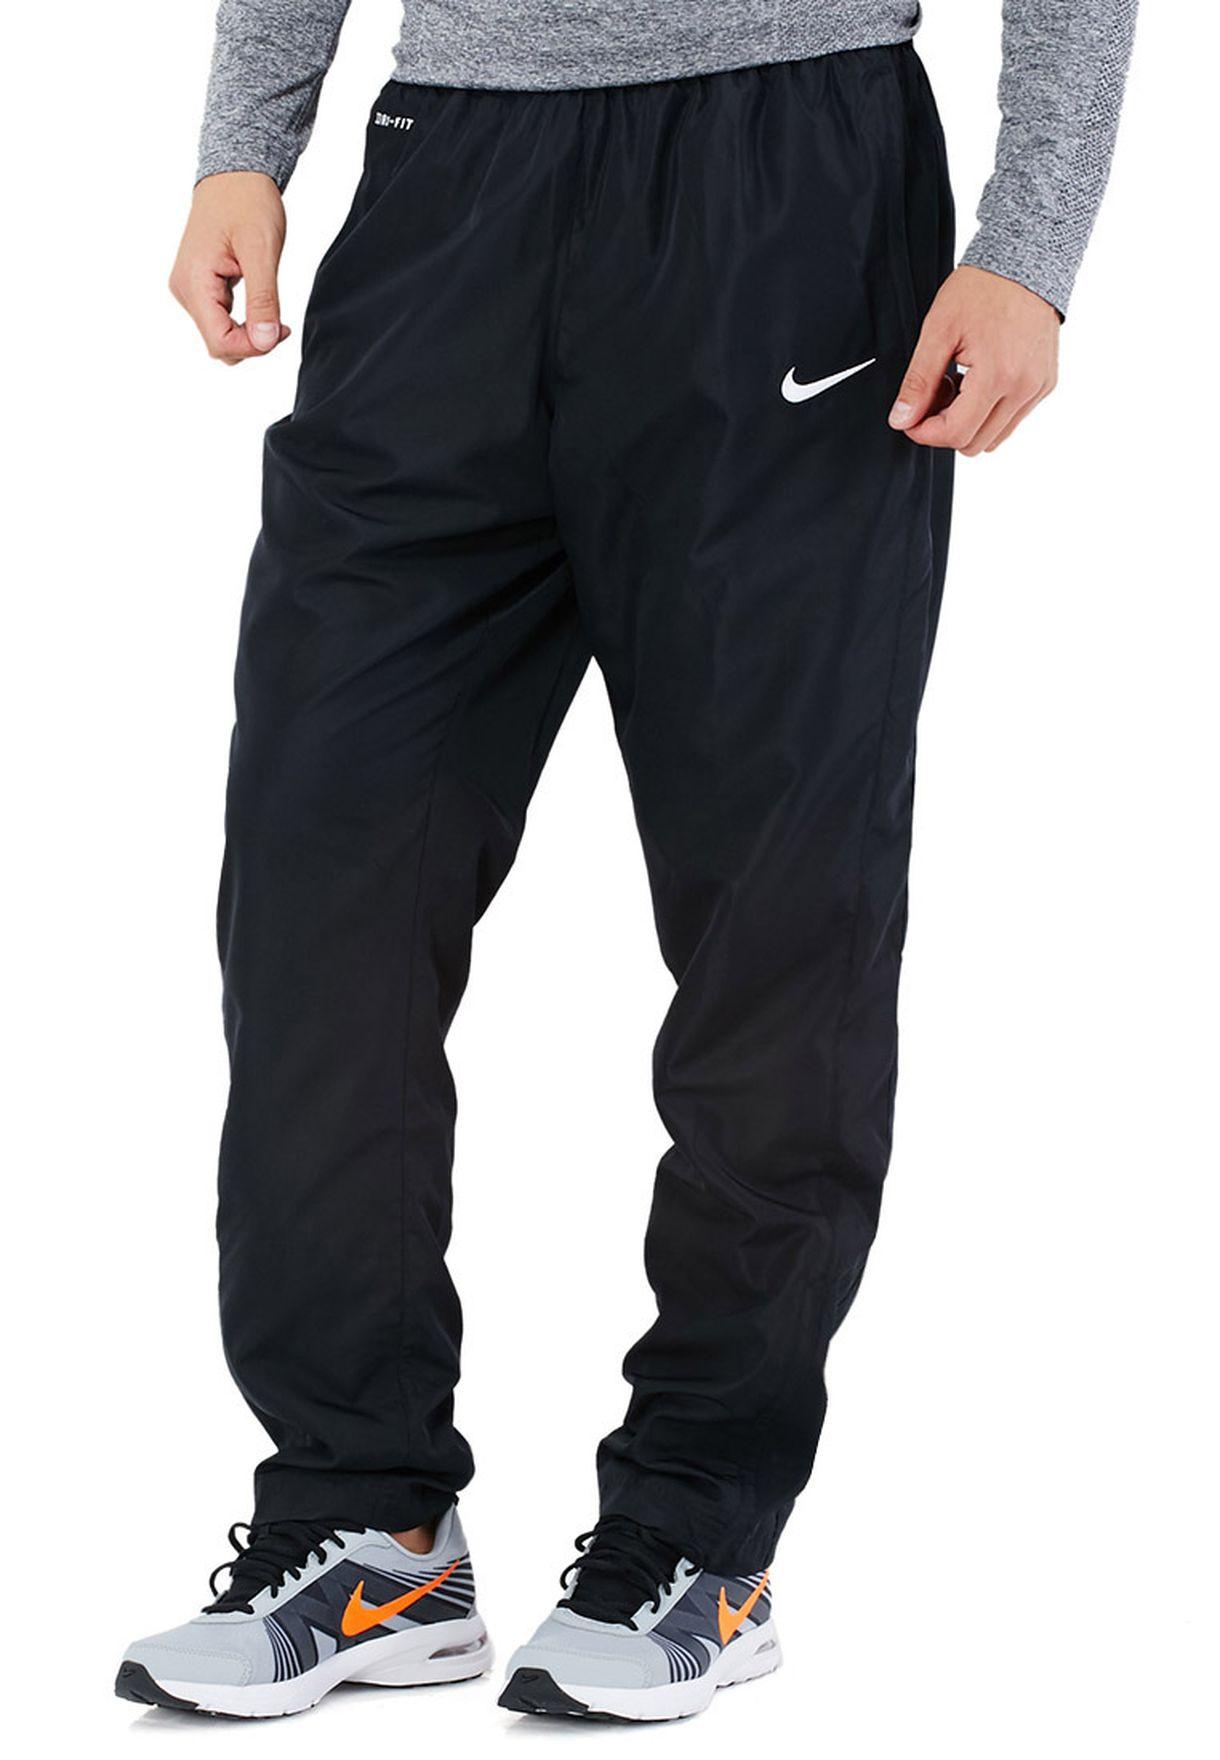 dac5d62a94 Libero Woven Pants